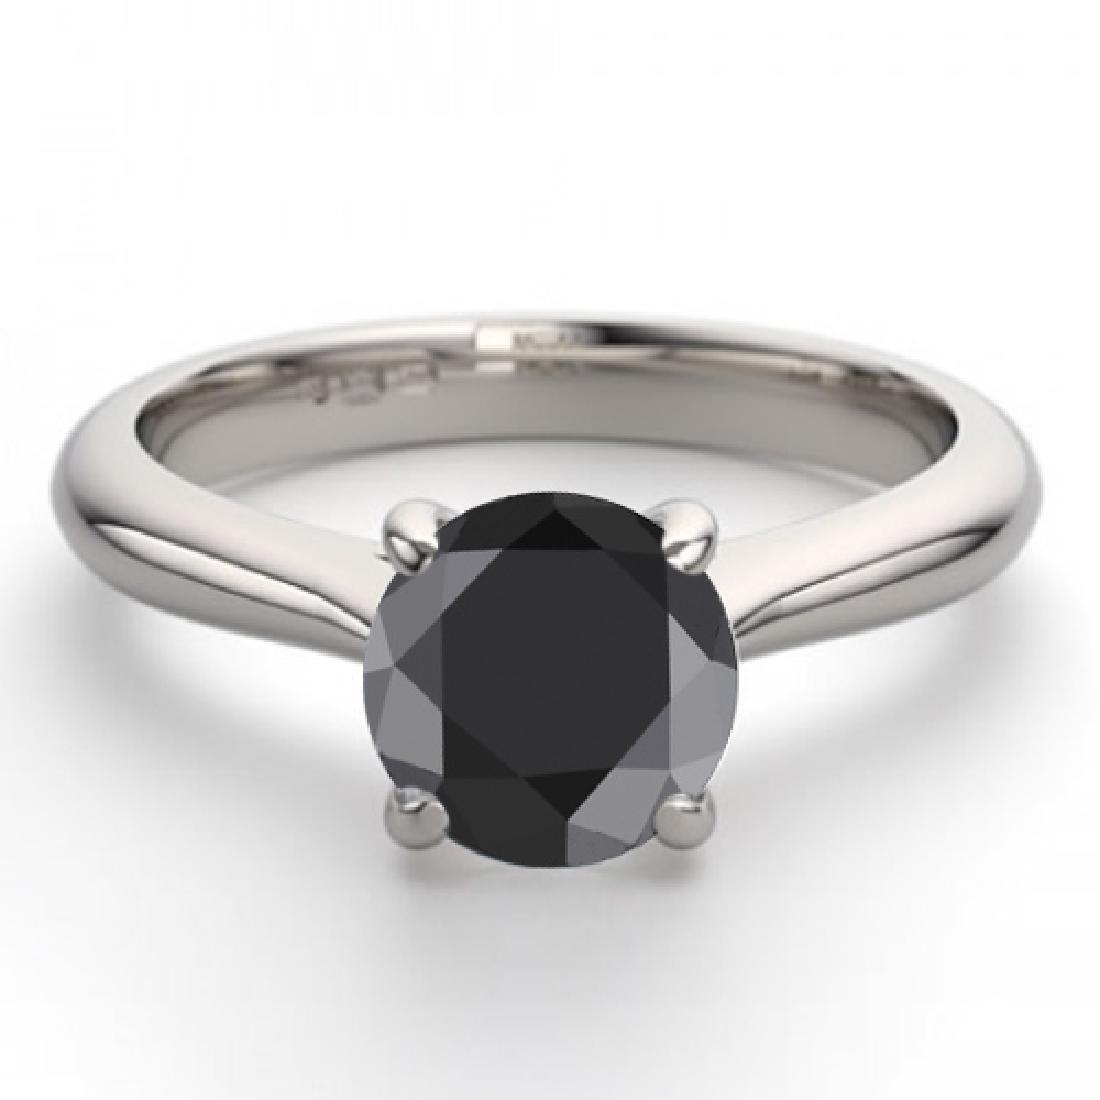 14K White Gold Jewelry 1.36 ctw Black Diamond Solitaire